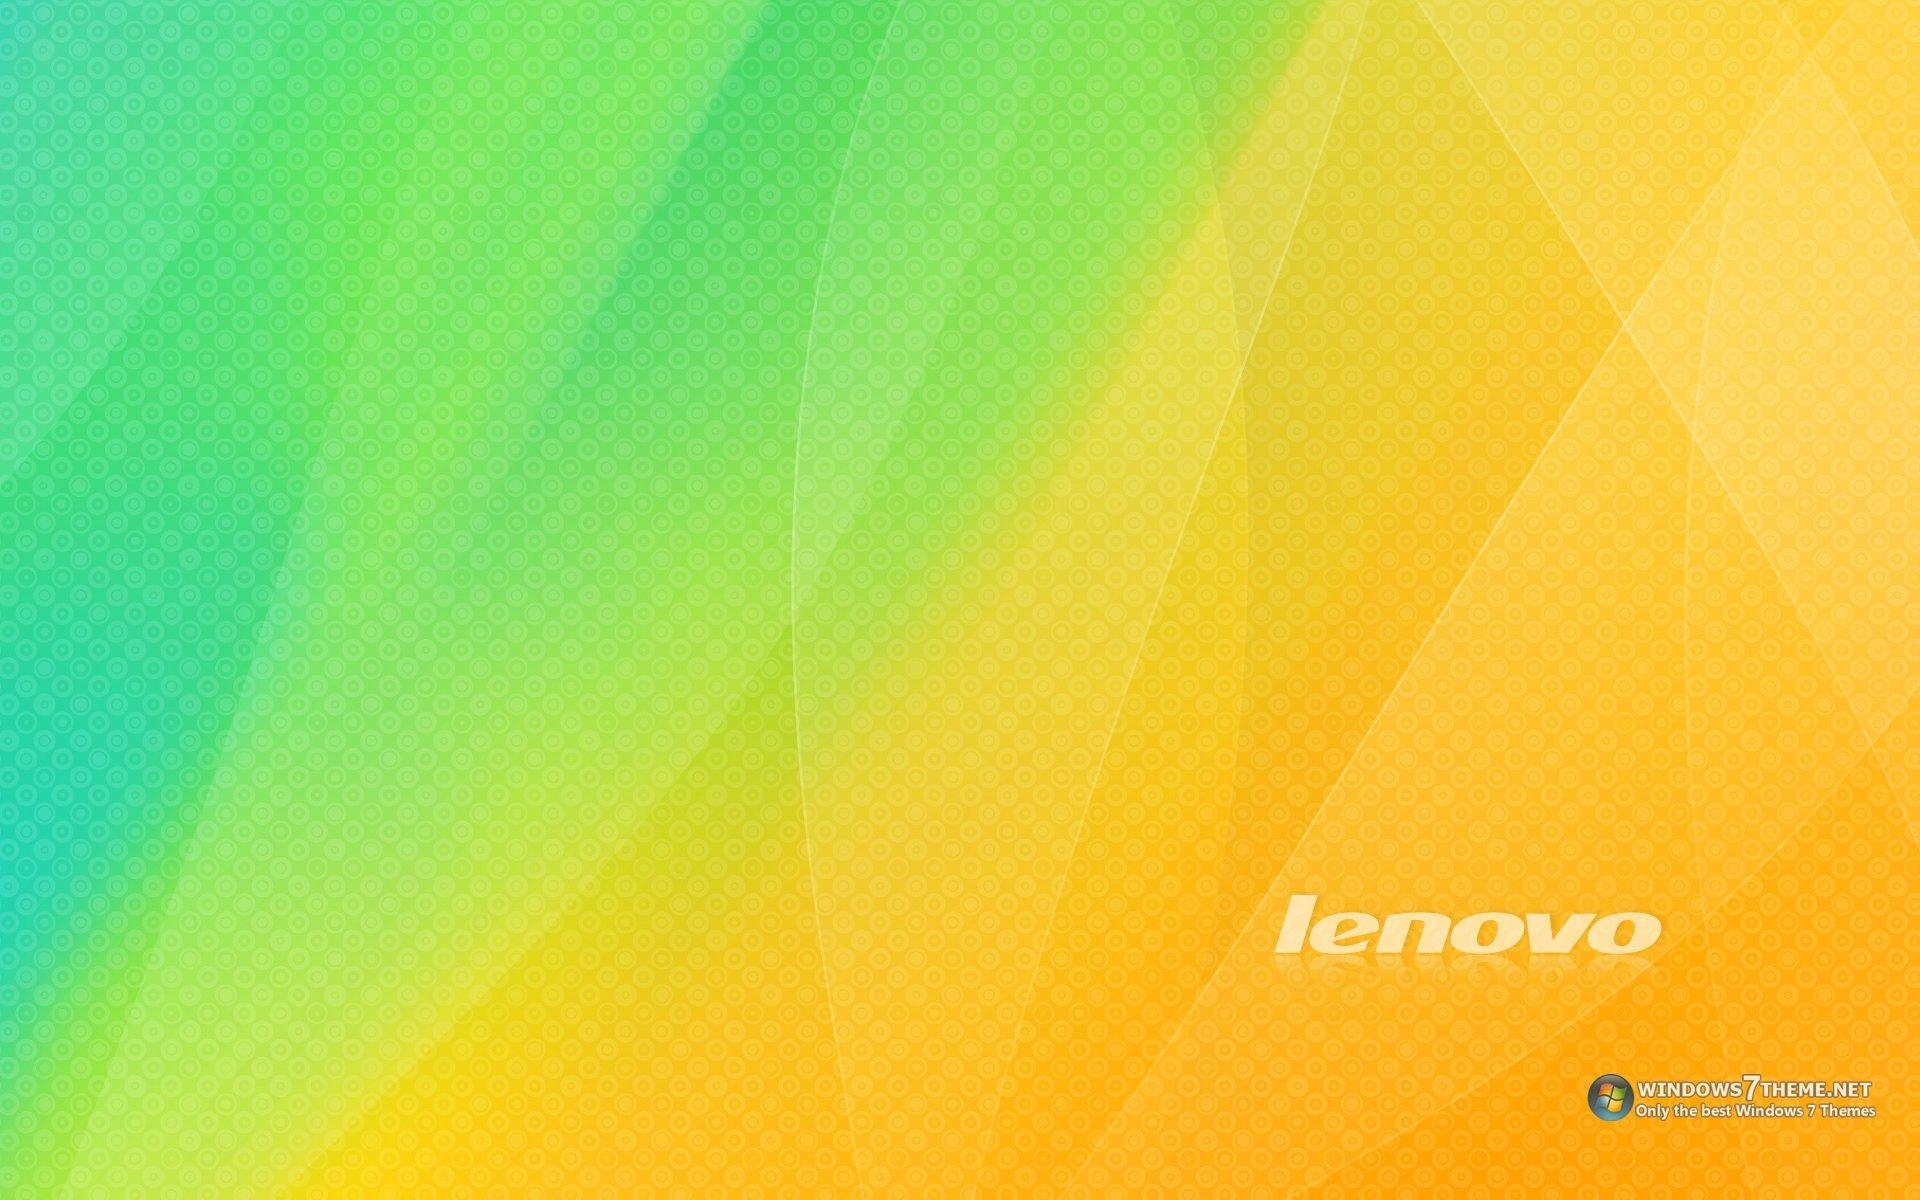 www wallpaperup com lenovo computer wallpaper background 1920 x 1200 1920x1200